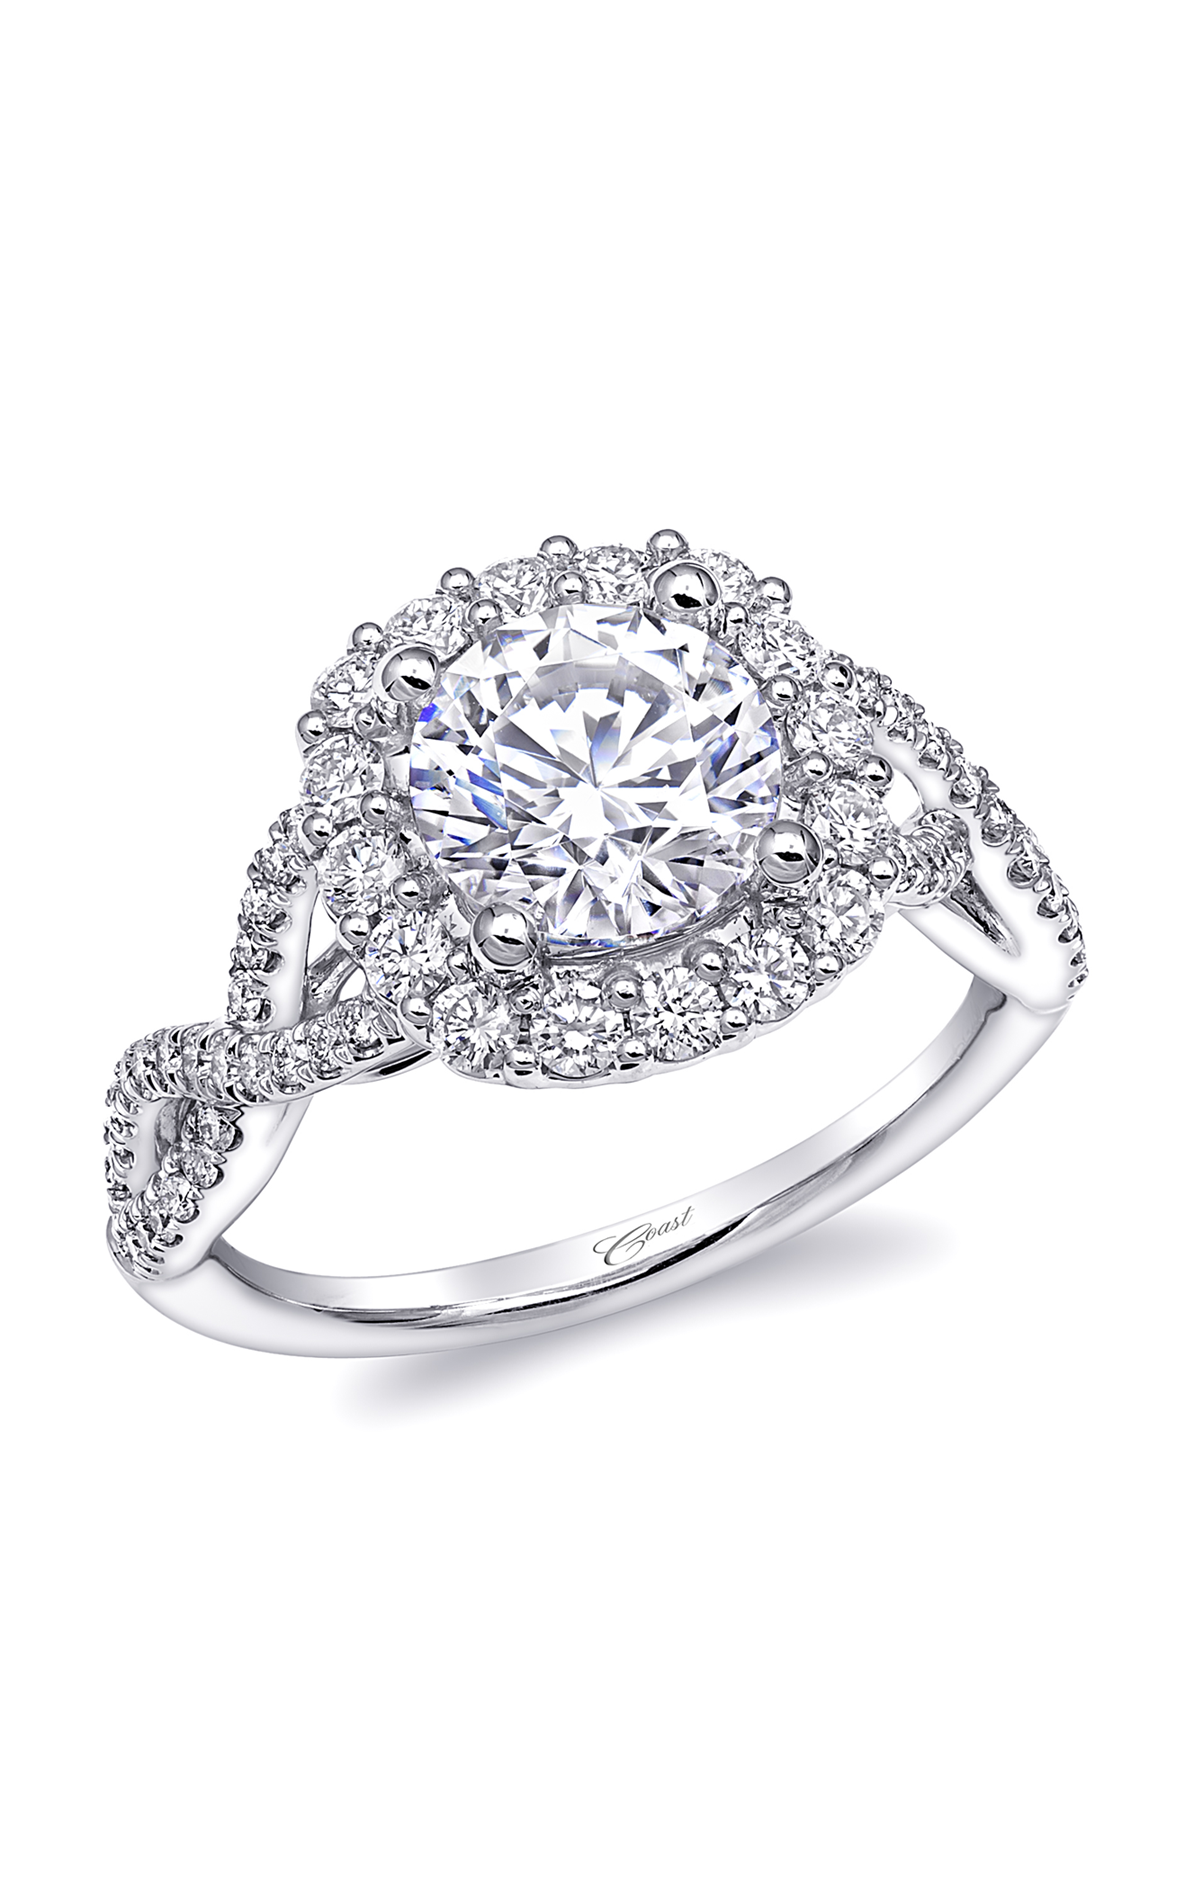 Coast Diamond Charisma LC10124 product image